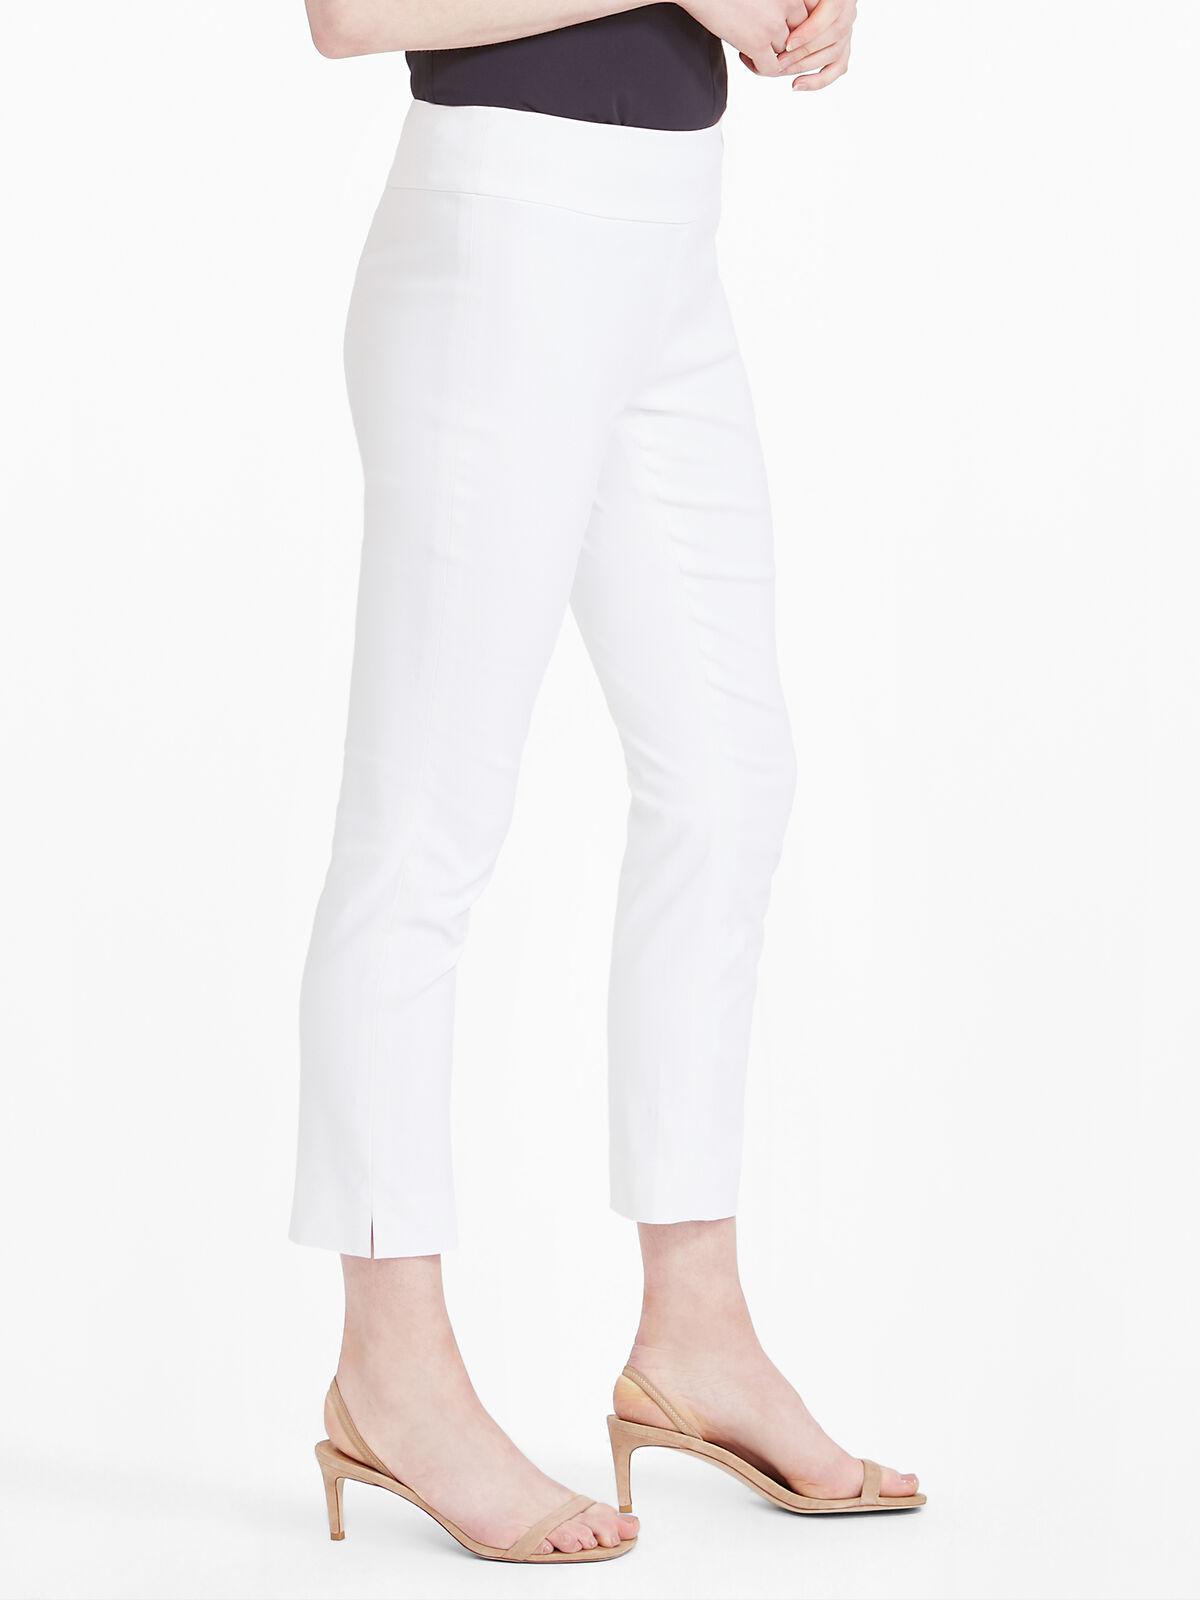 Crop Polished Wonderstretch Pant